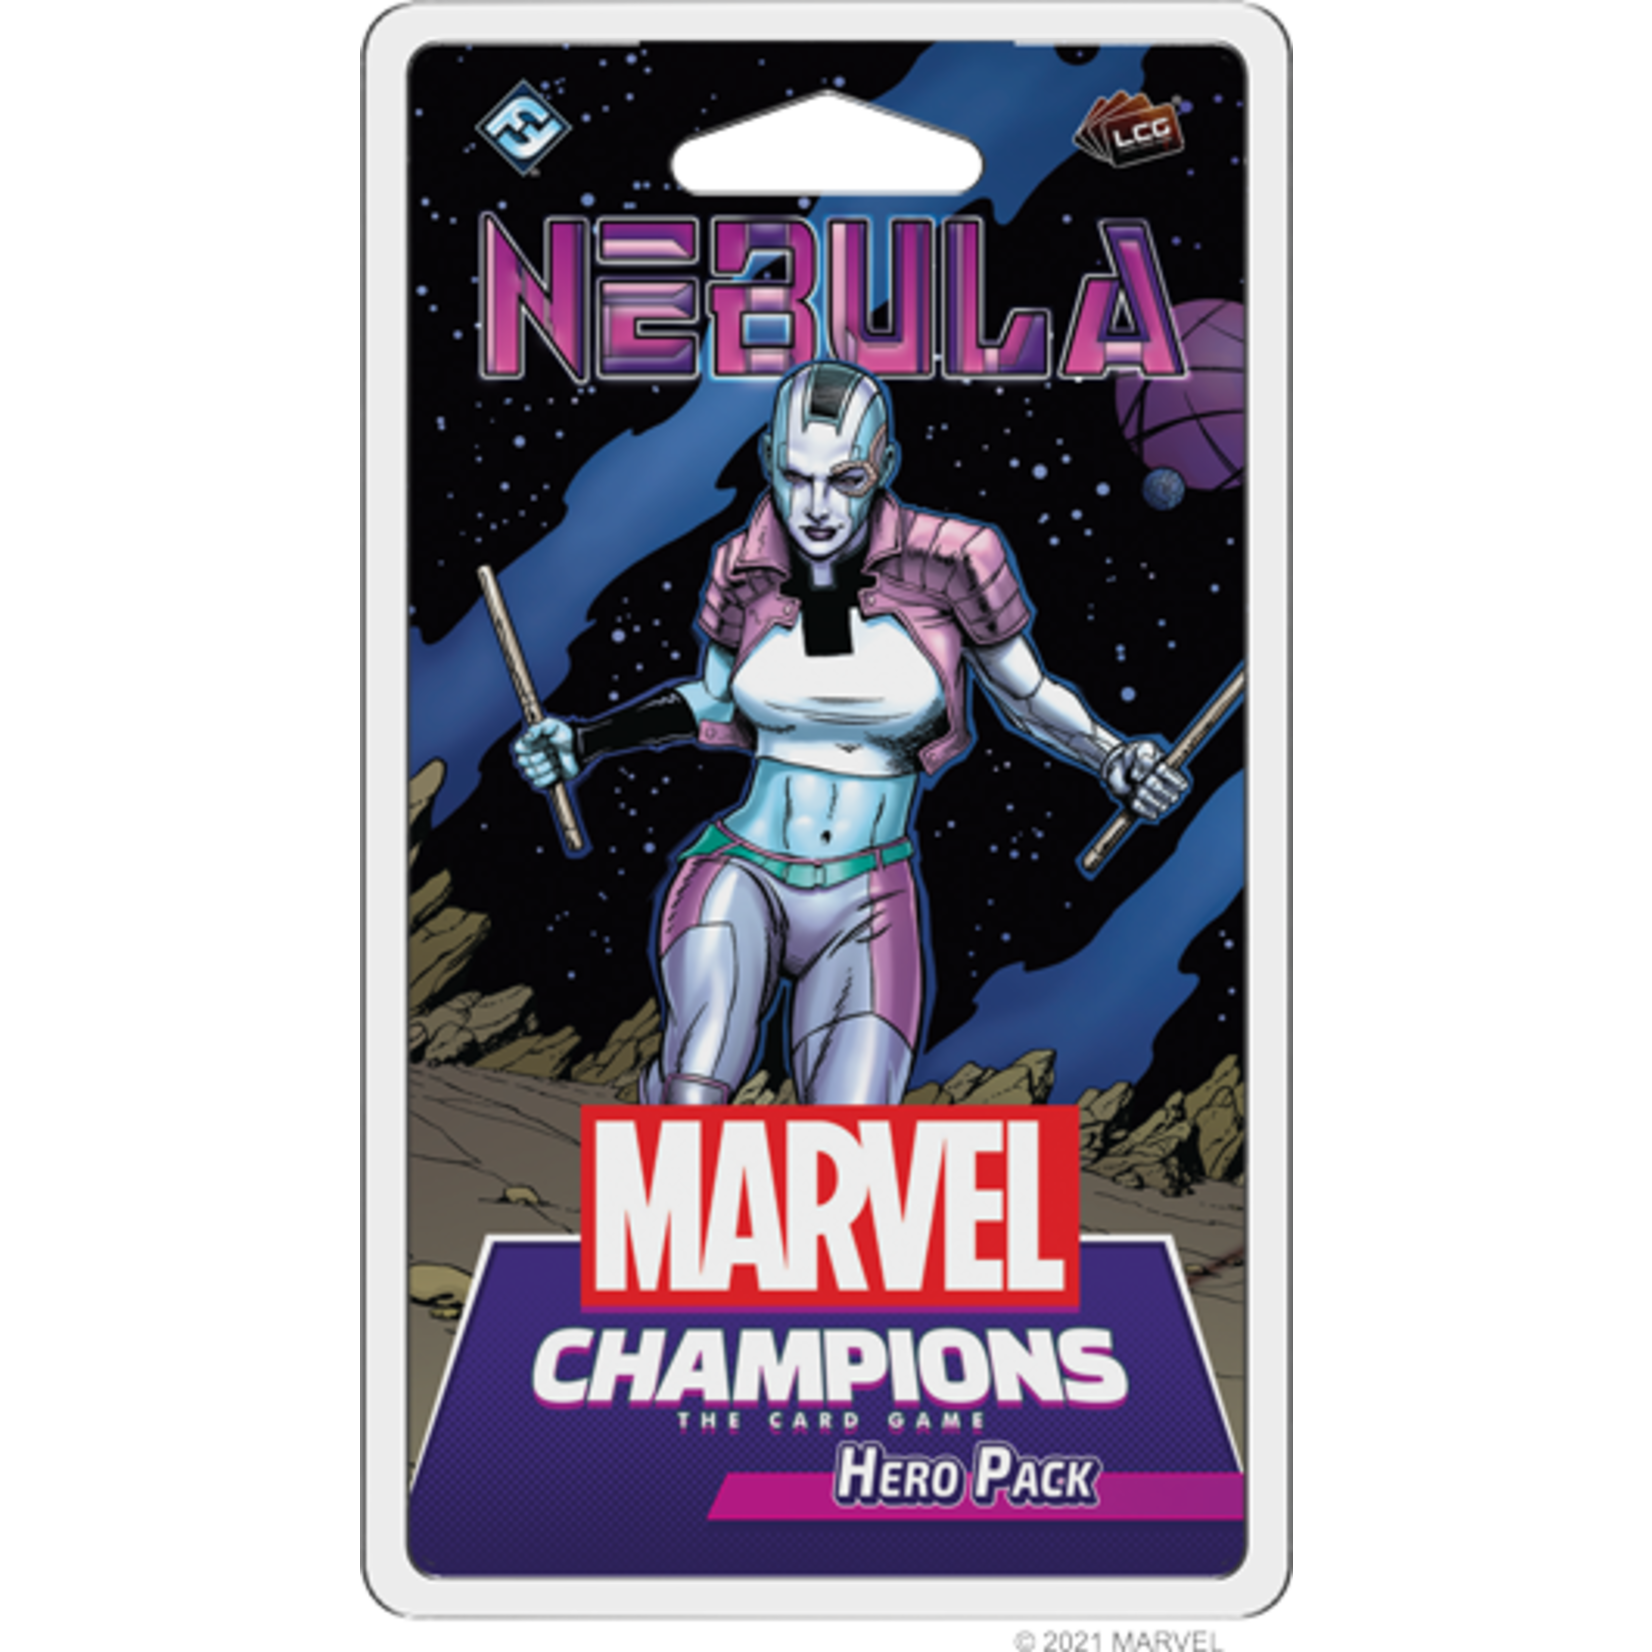 Fantasy Flight Games Marvel Champions Living Card Game: Nebula Hero Pack